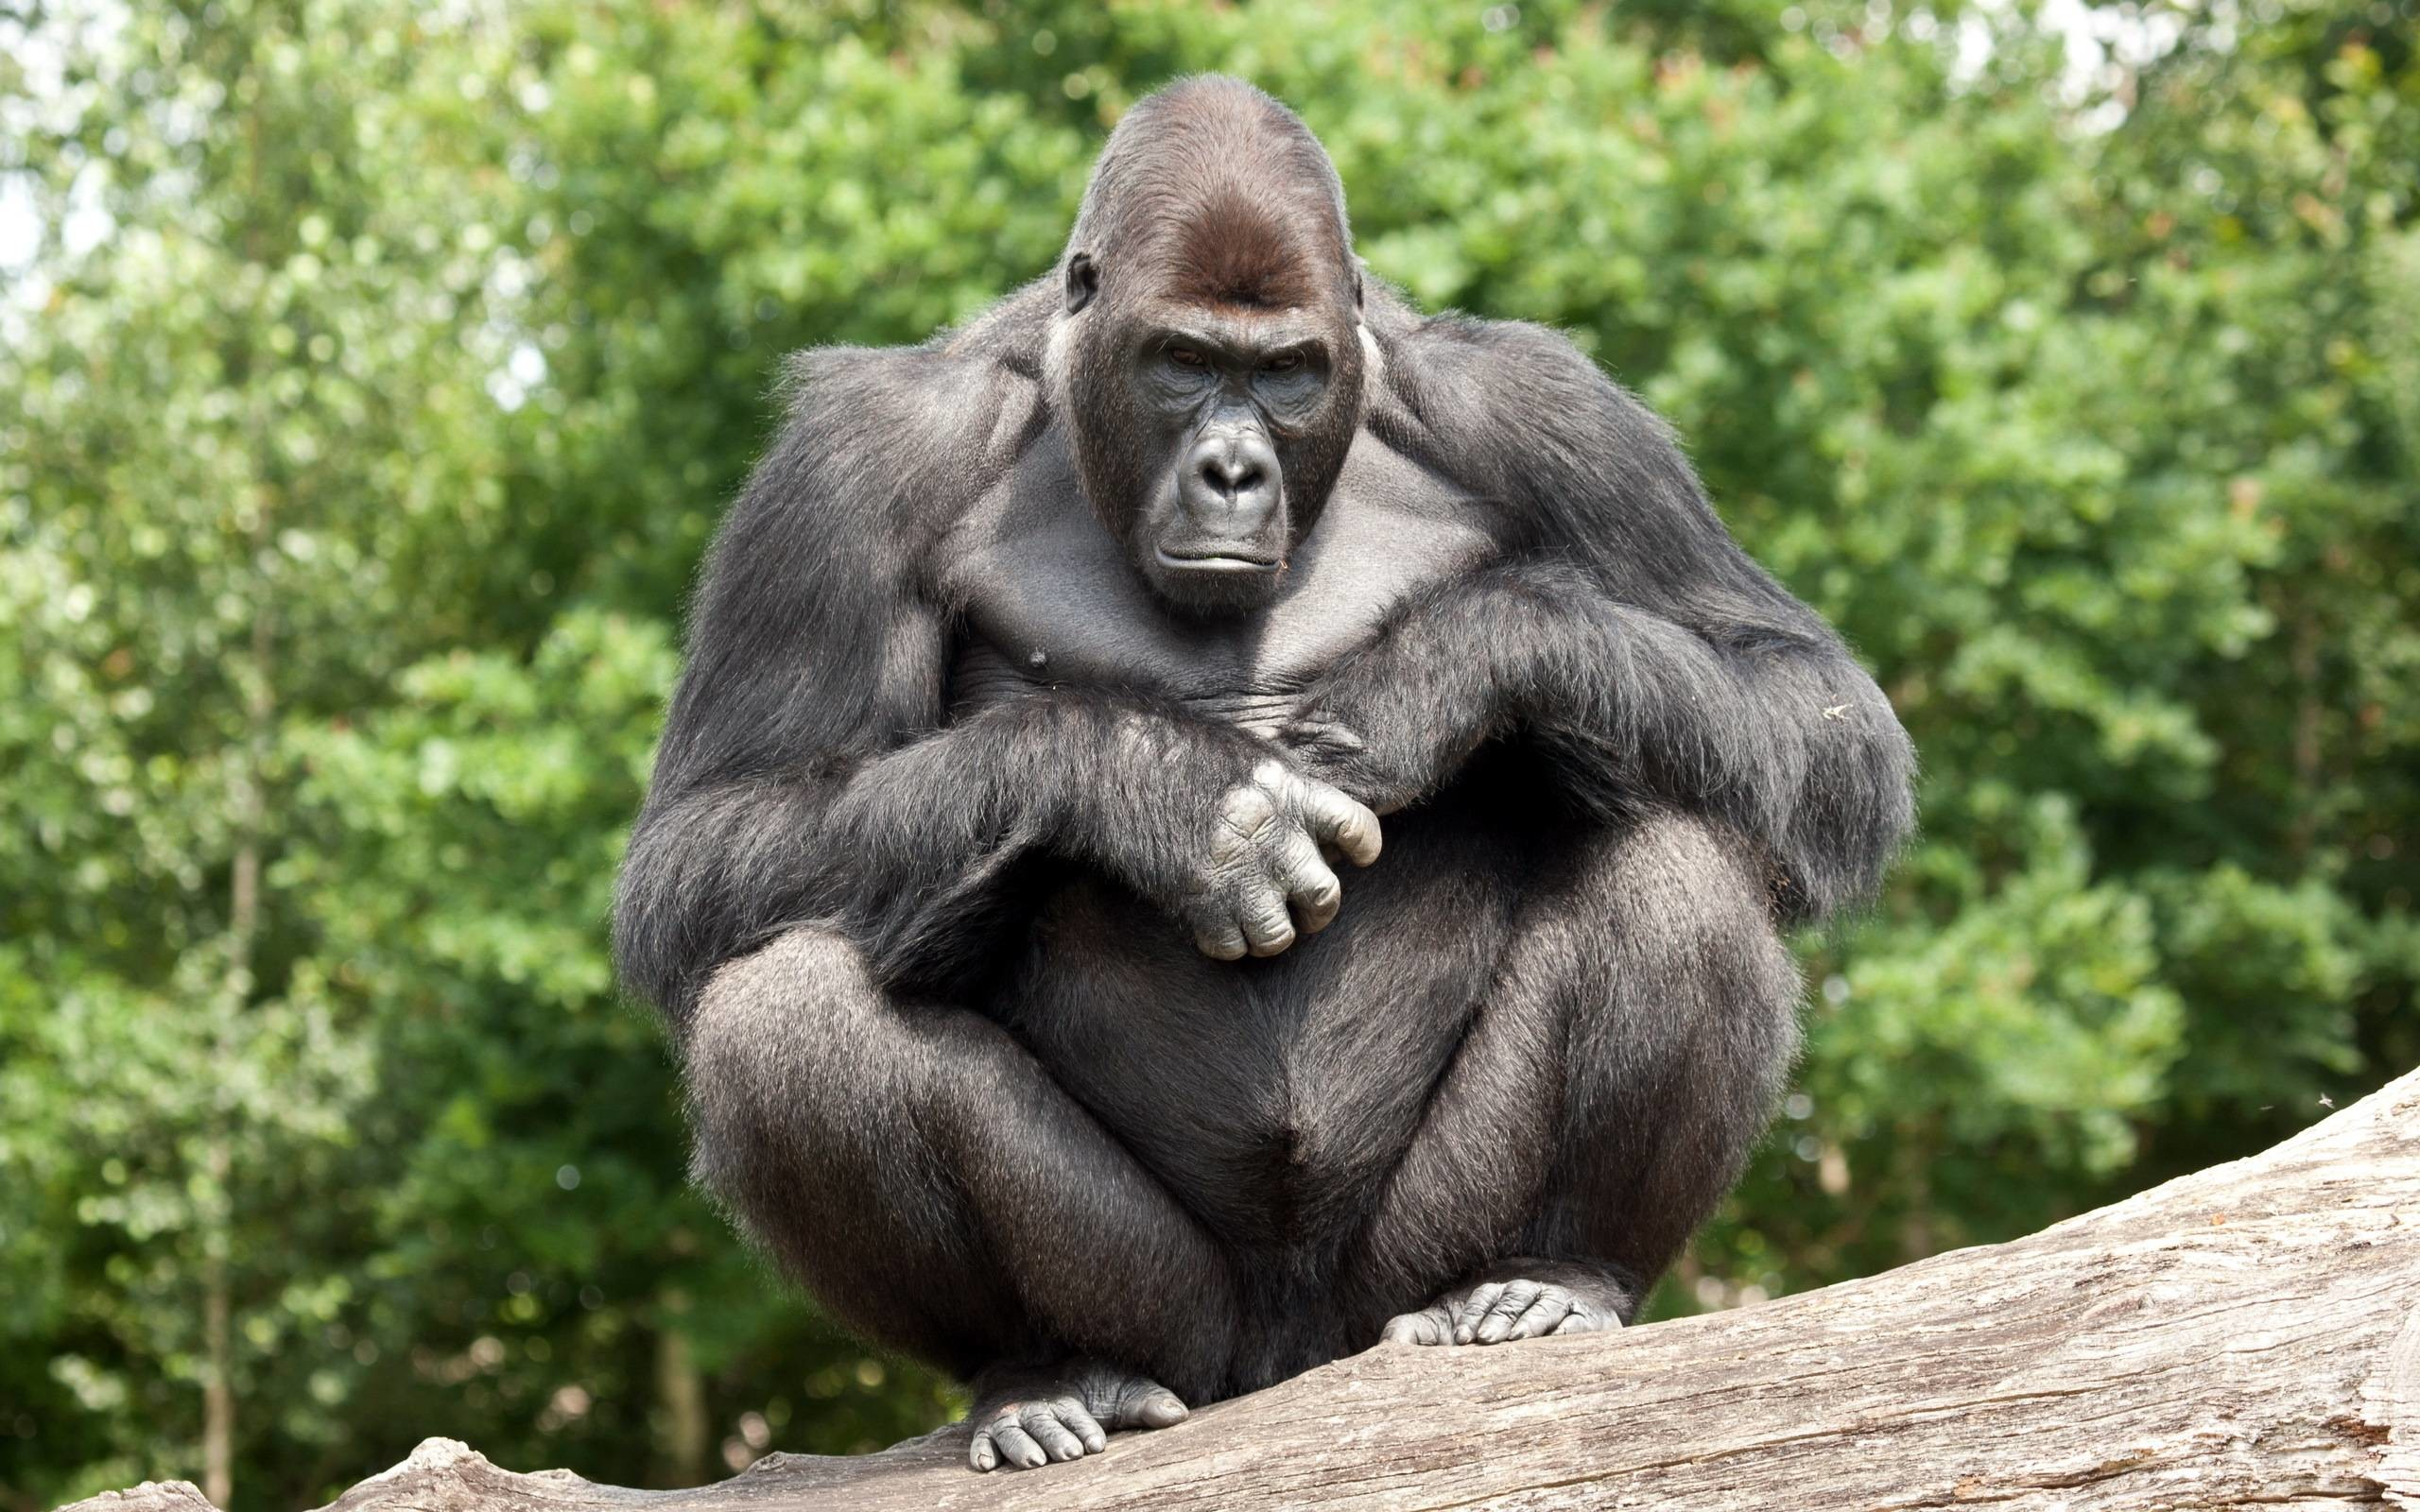 gorilla wallpapers free, funny gorilla